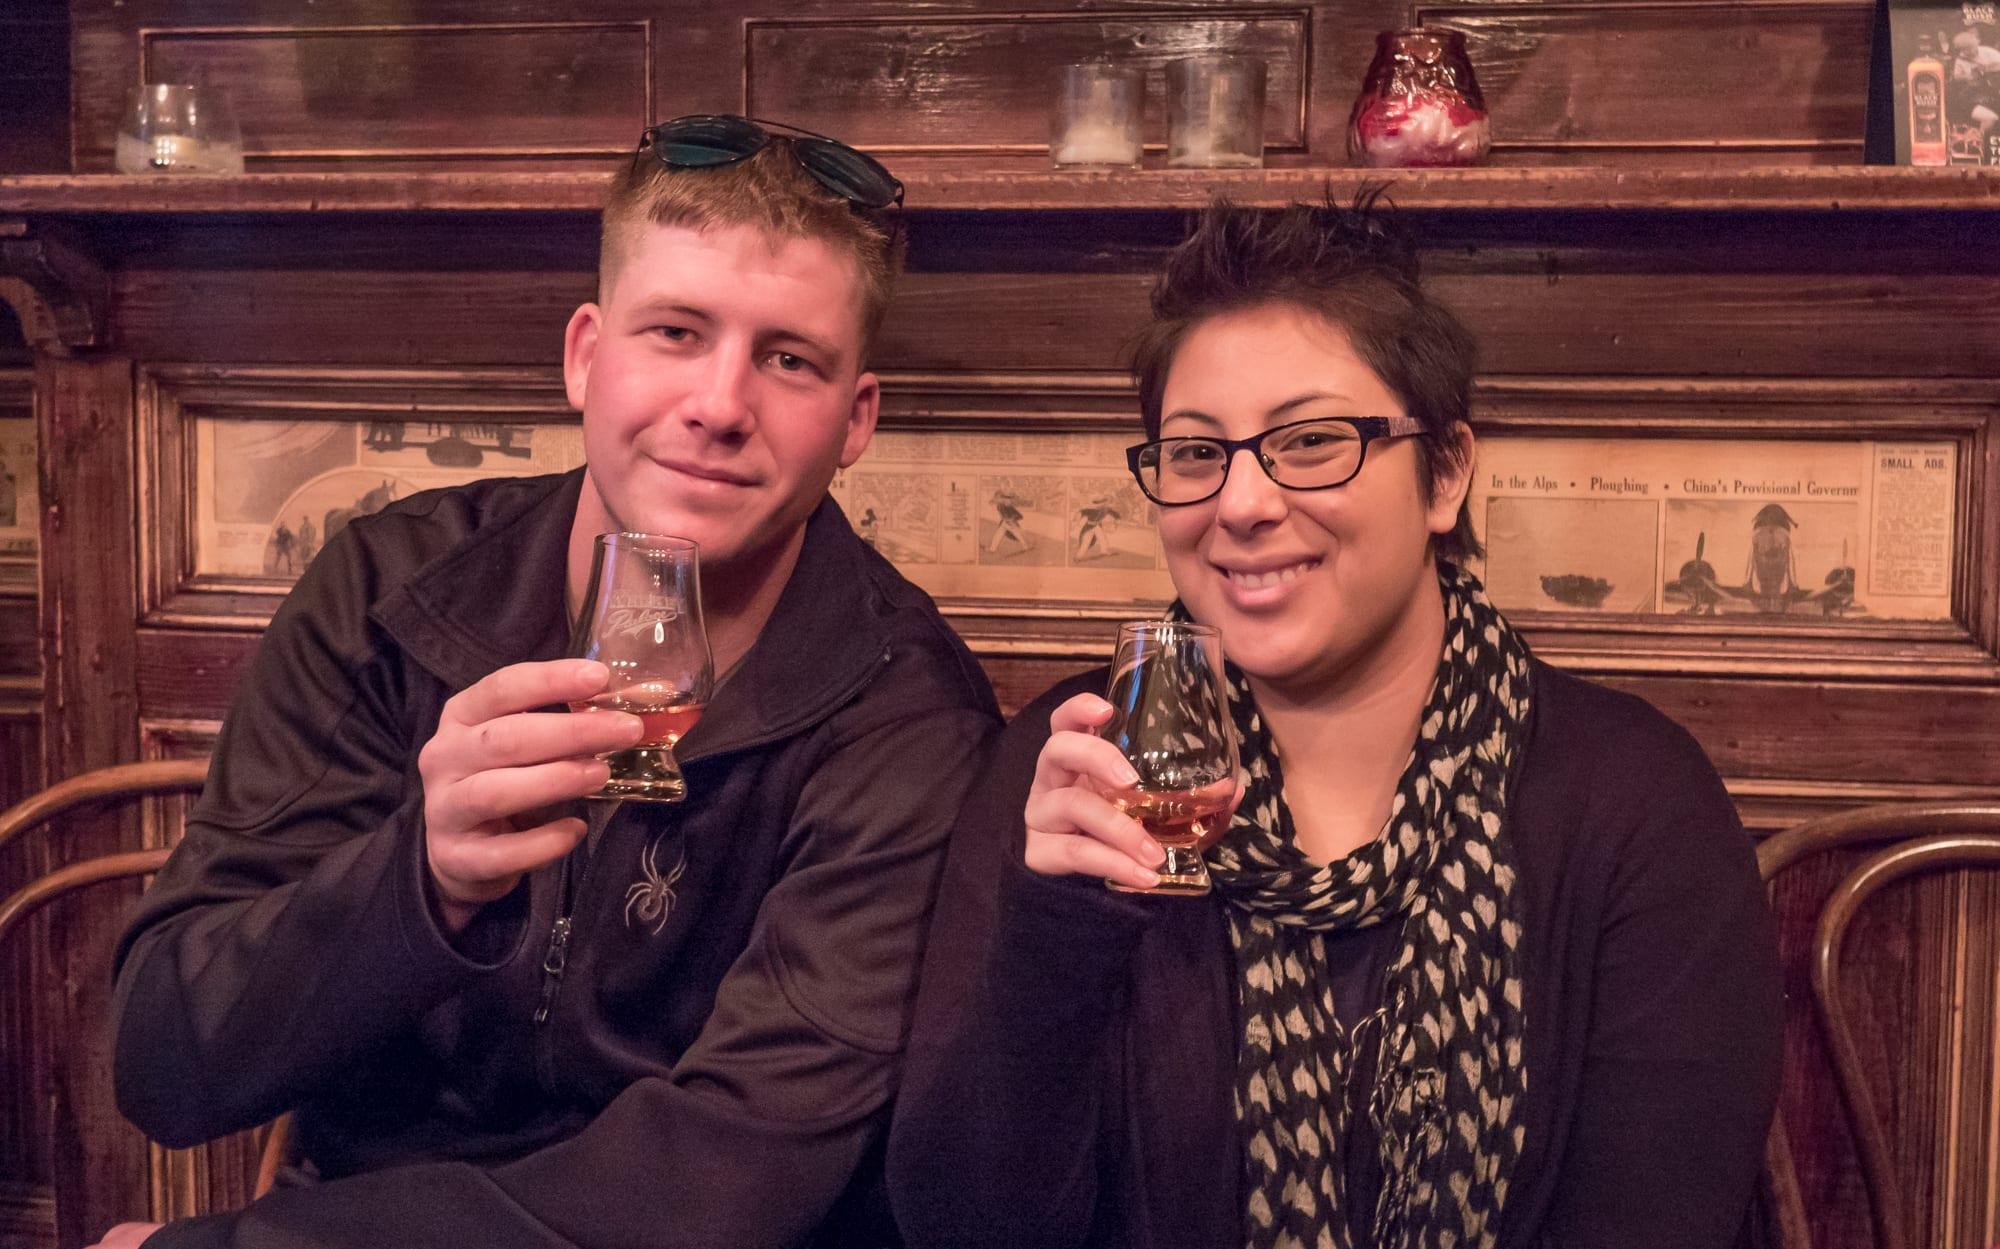 Wine tasting dating dublin